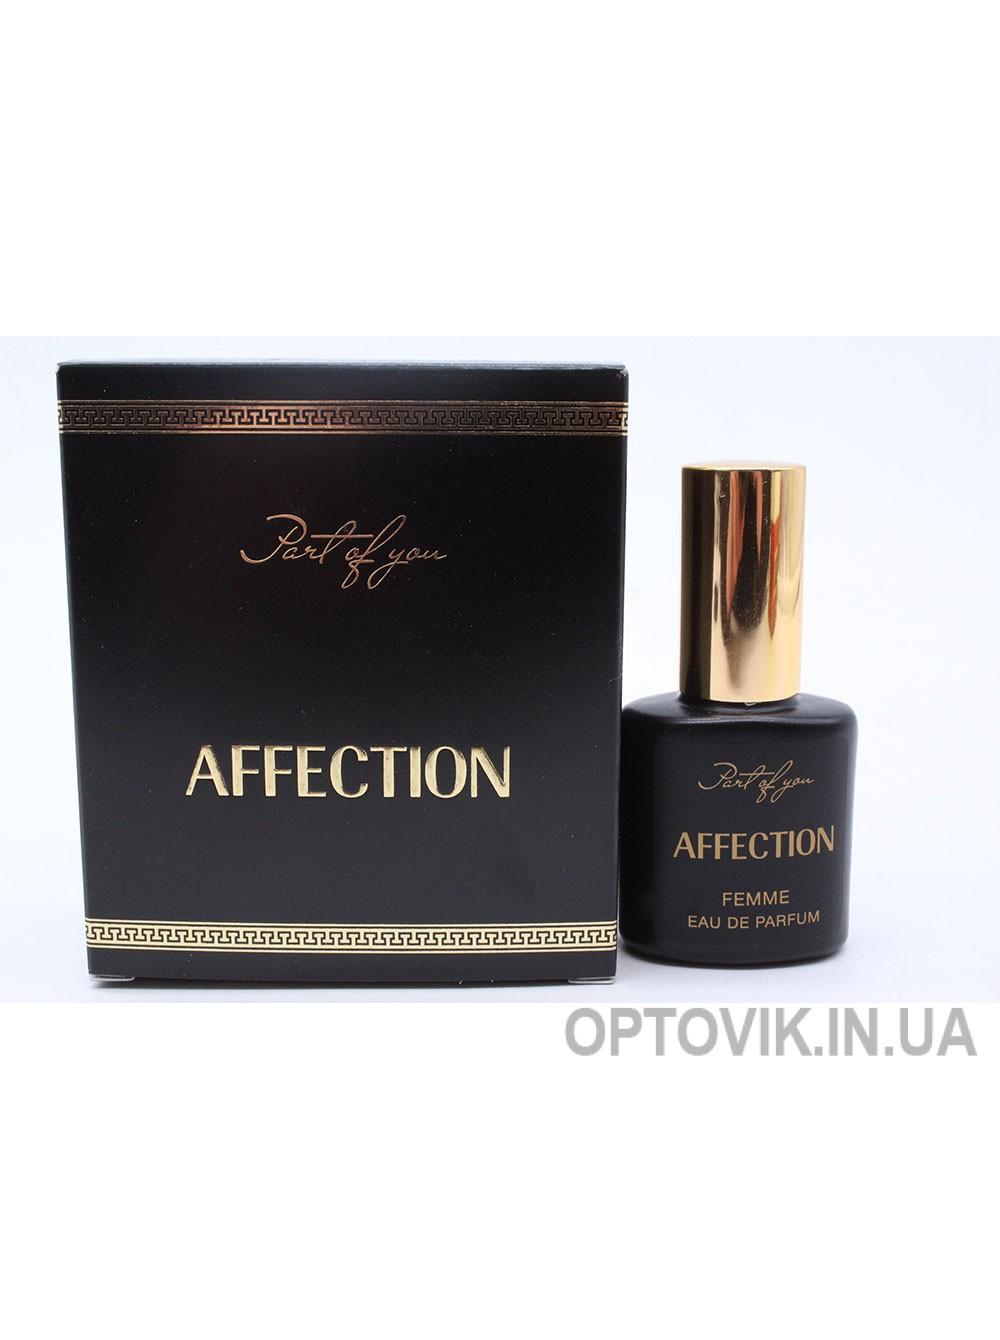 Женский парфюм тестер: Crystal noir versace 17мл